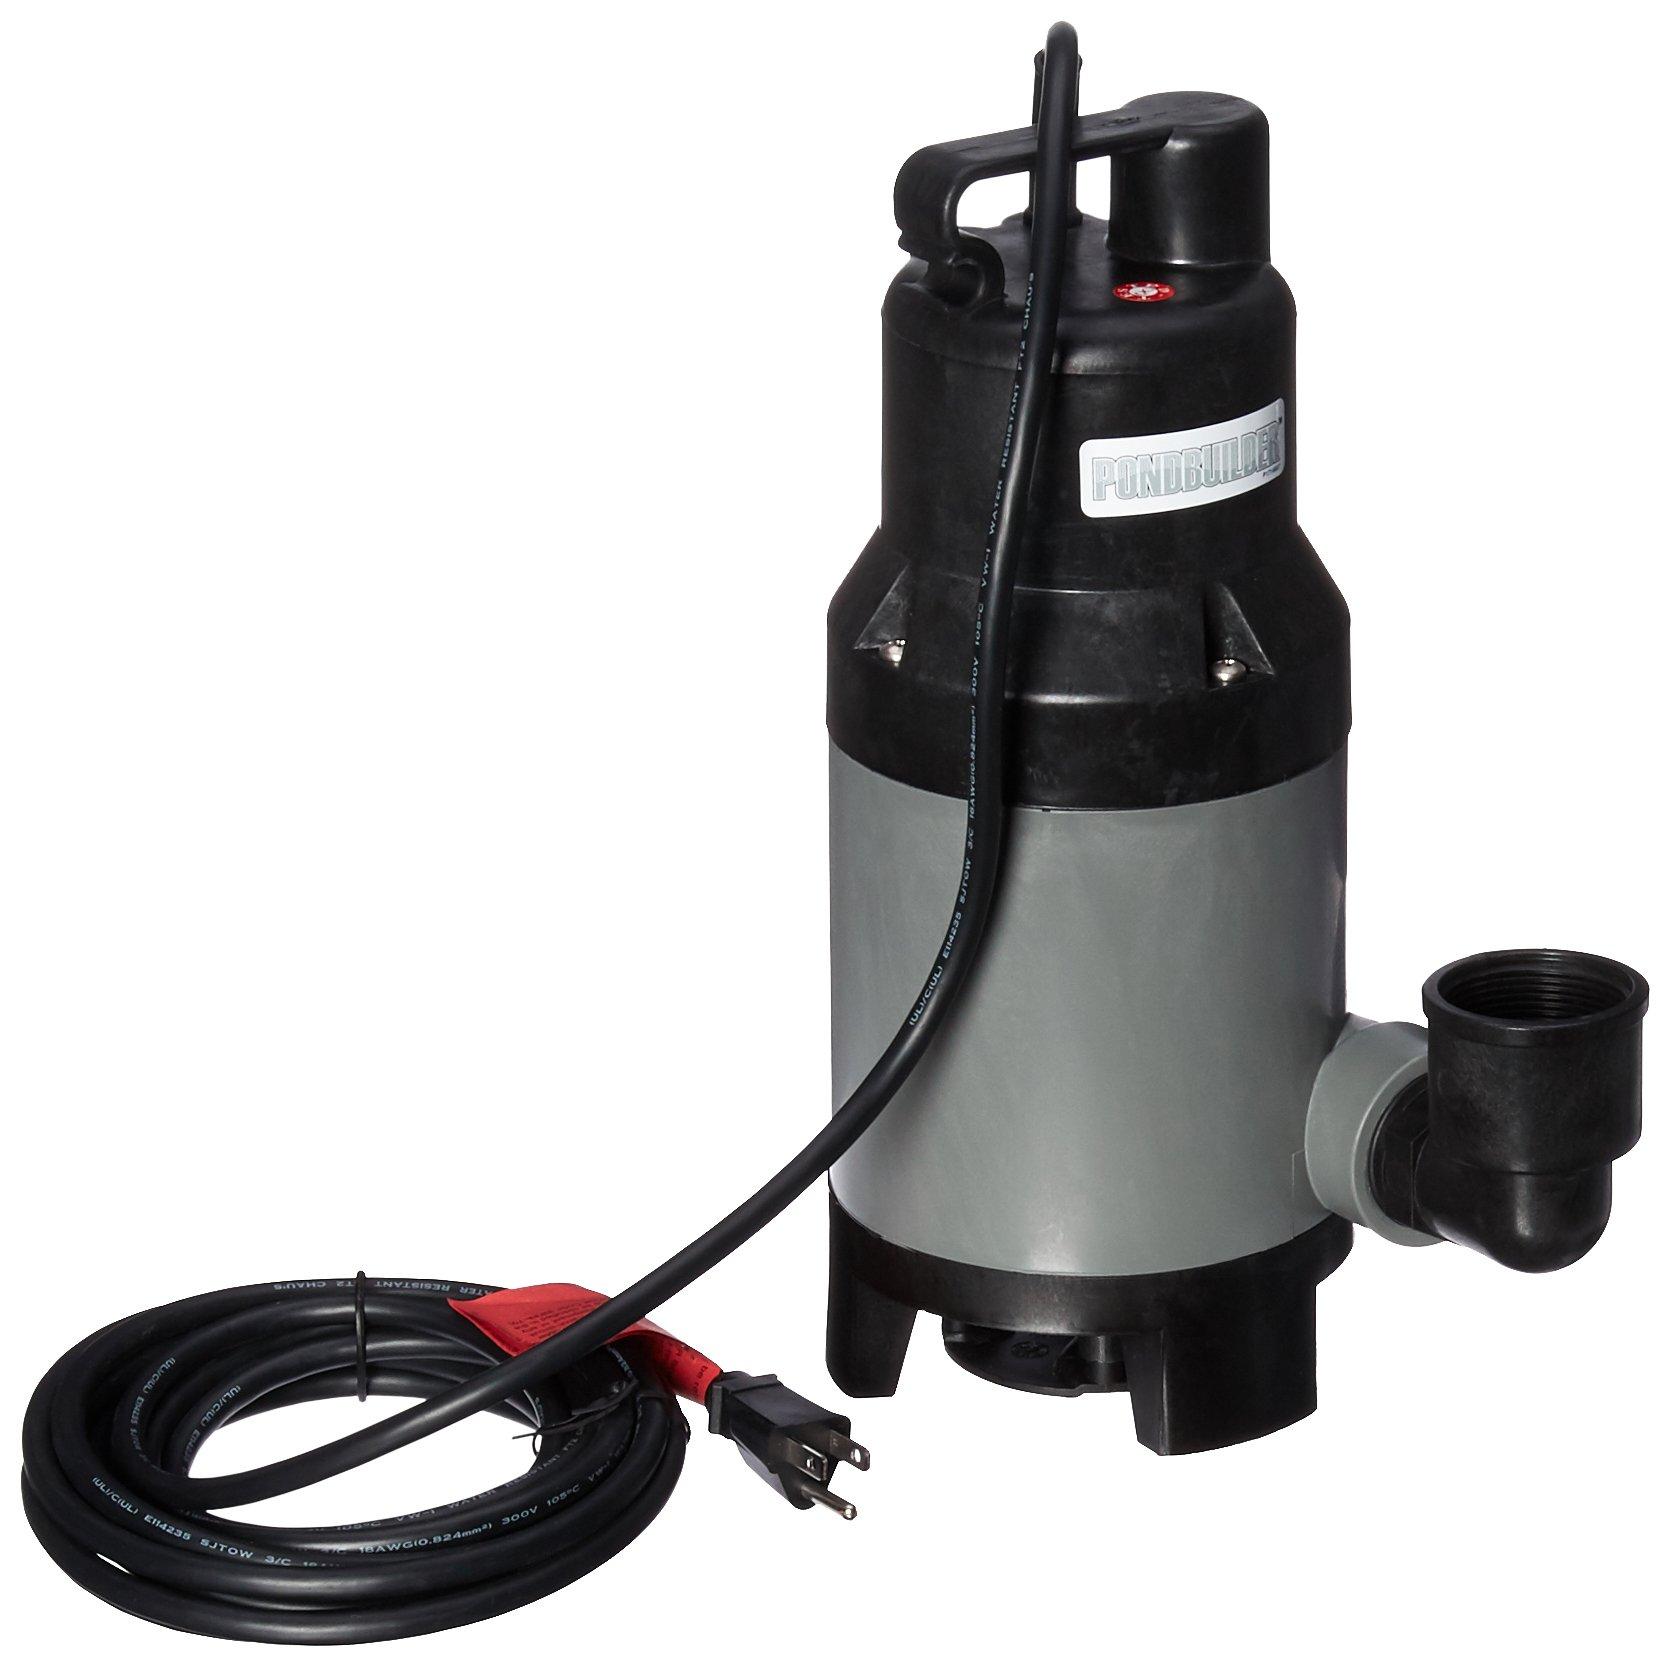 Pond Builder Solids Handling Pump, 3840 GPH by Pond Builder